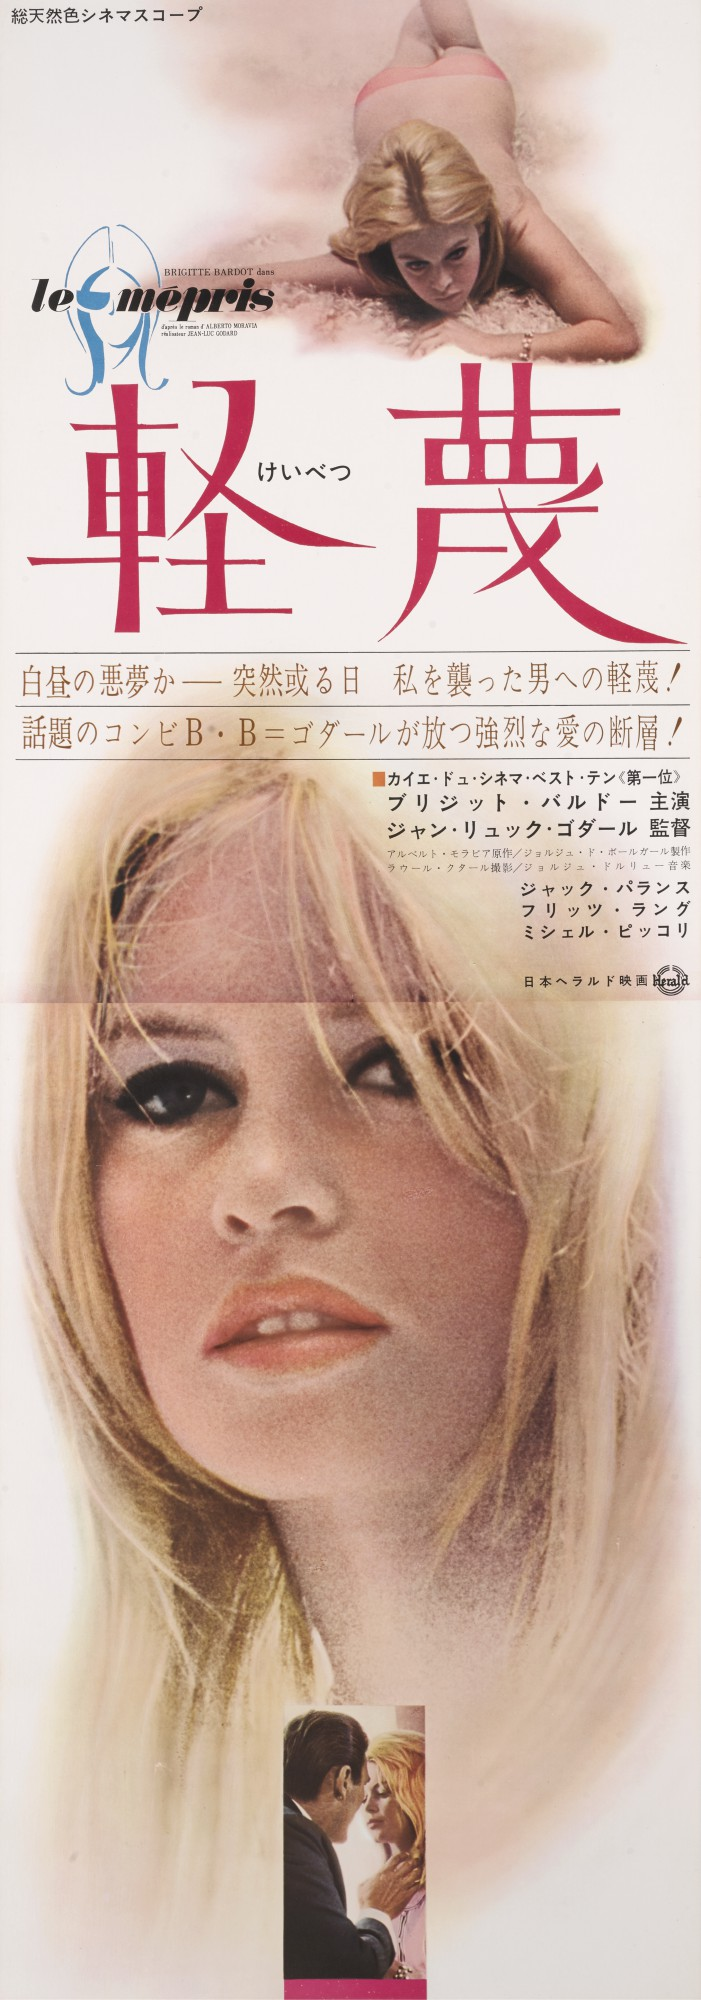 LE MEPRIS (1963) POSTER, JAPANESE